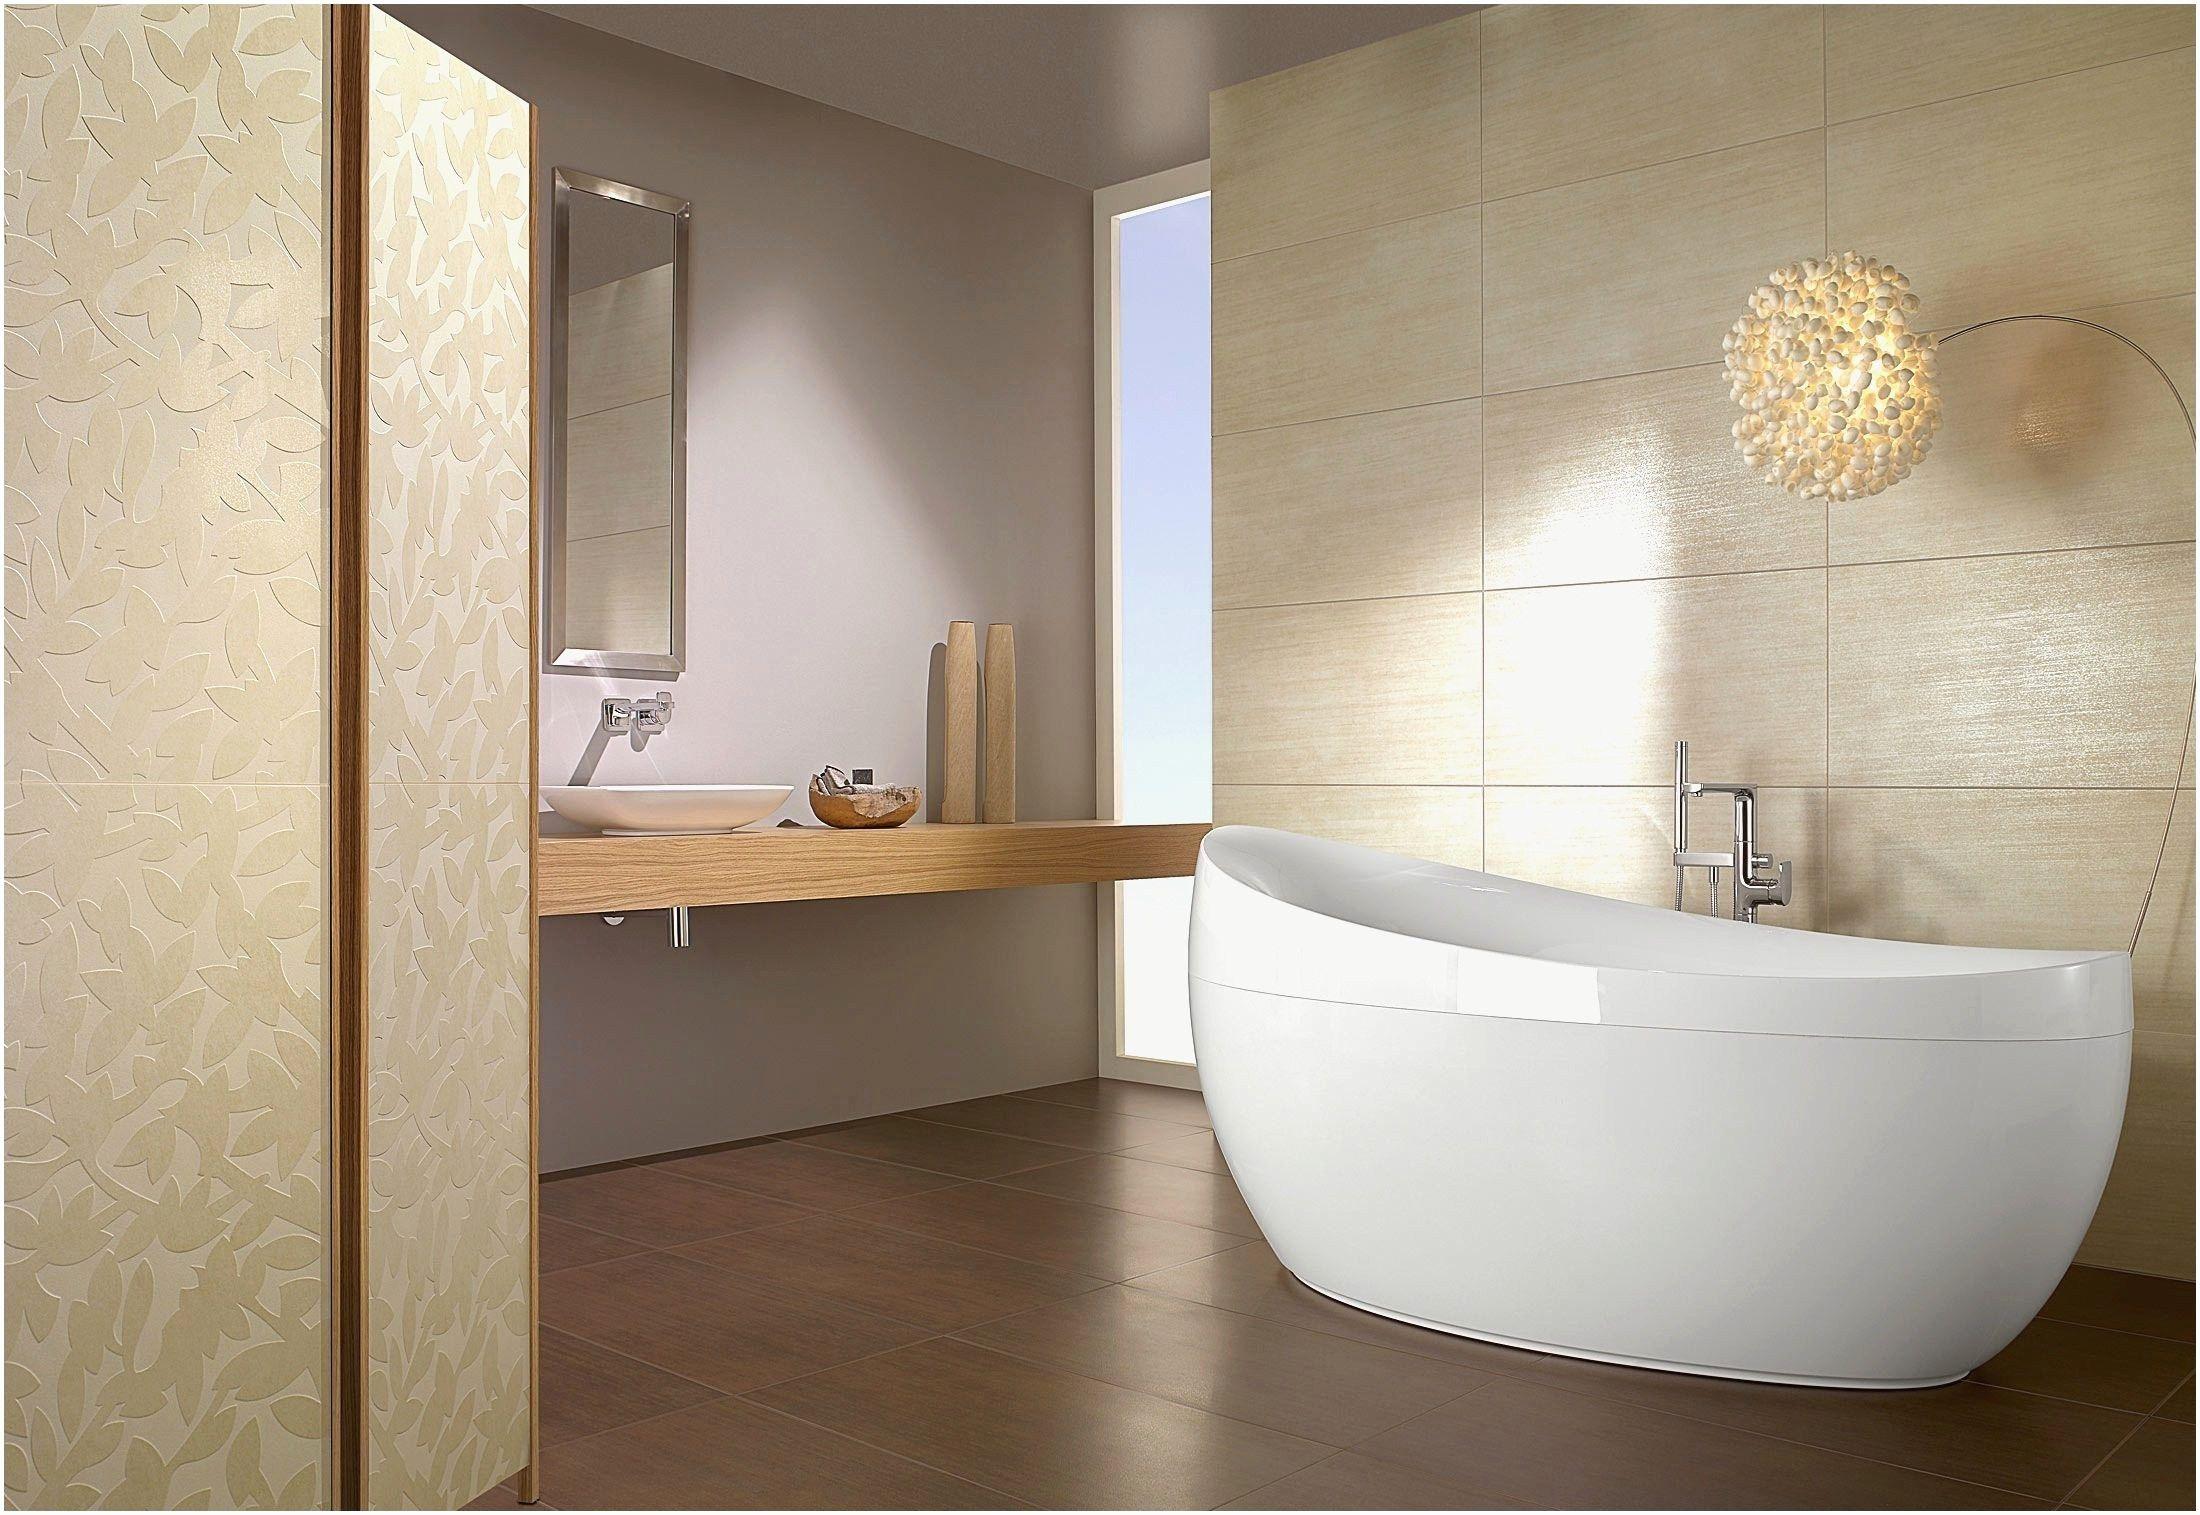 44 Wunderschon Badezimmer Aufbewahrung Bauhaus Badezimmer Dekor Diy Badezimmer Dekor